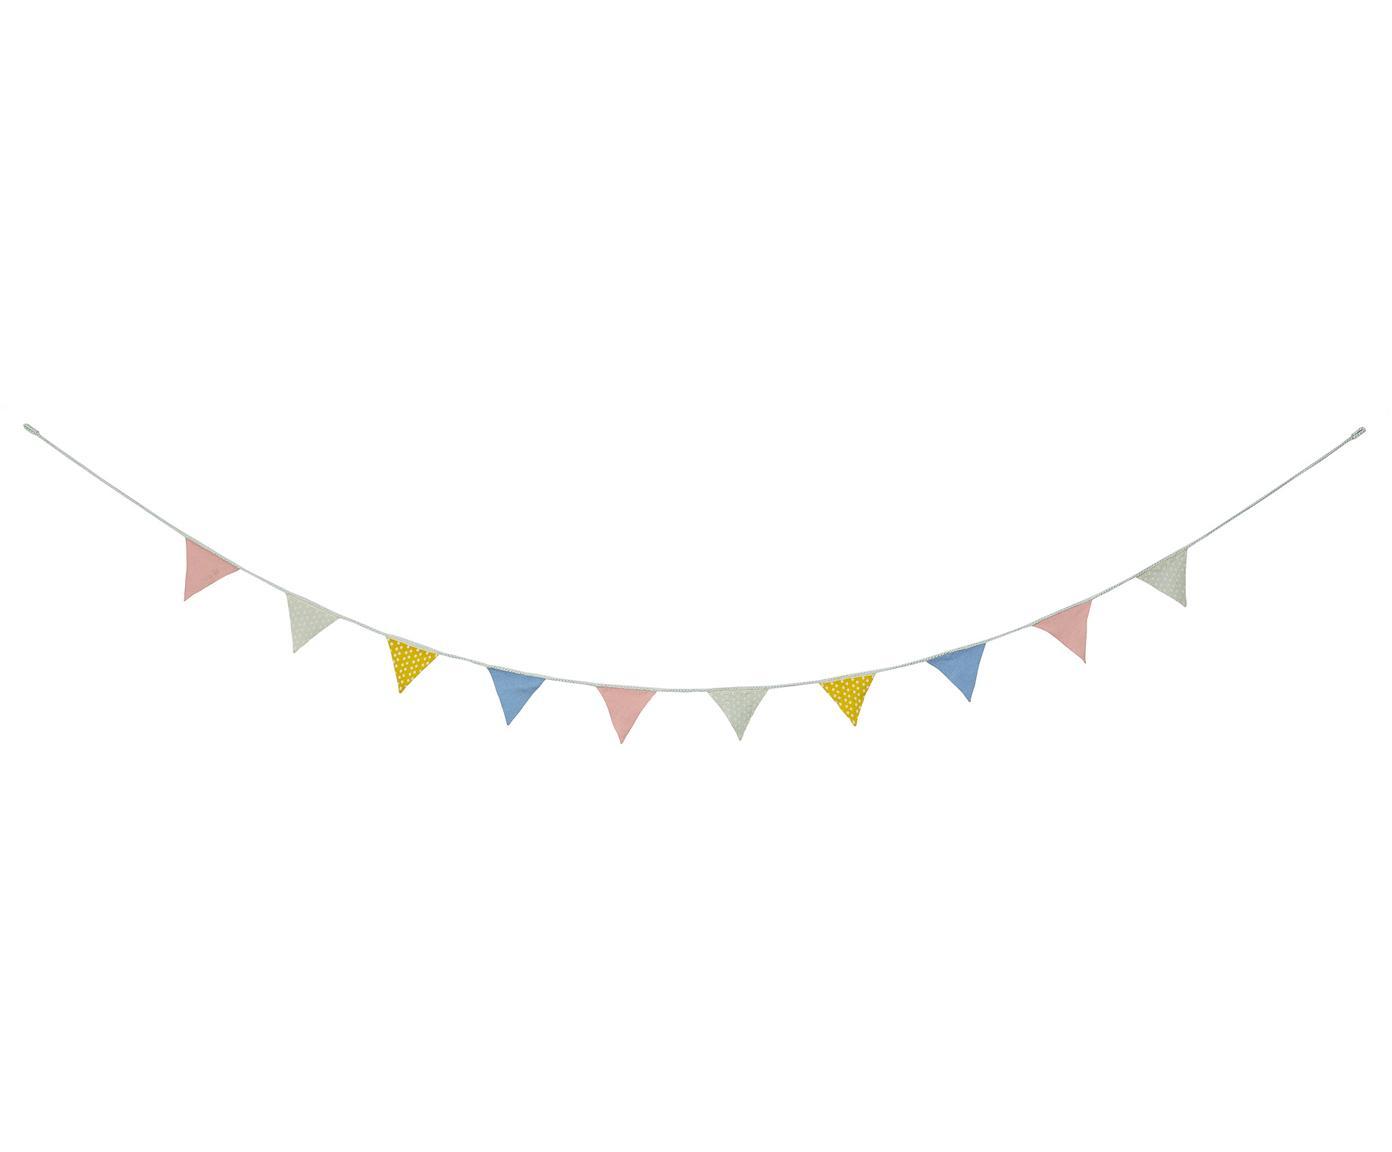 Girlande Triangles, Baumwolle, Mehrfarbig, 12 x 12 cm